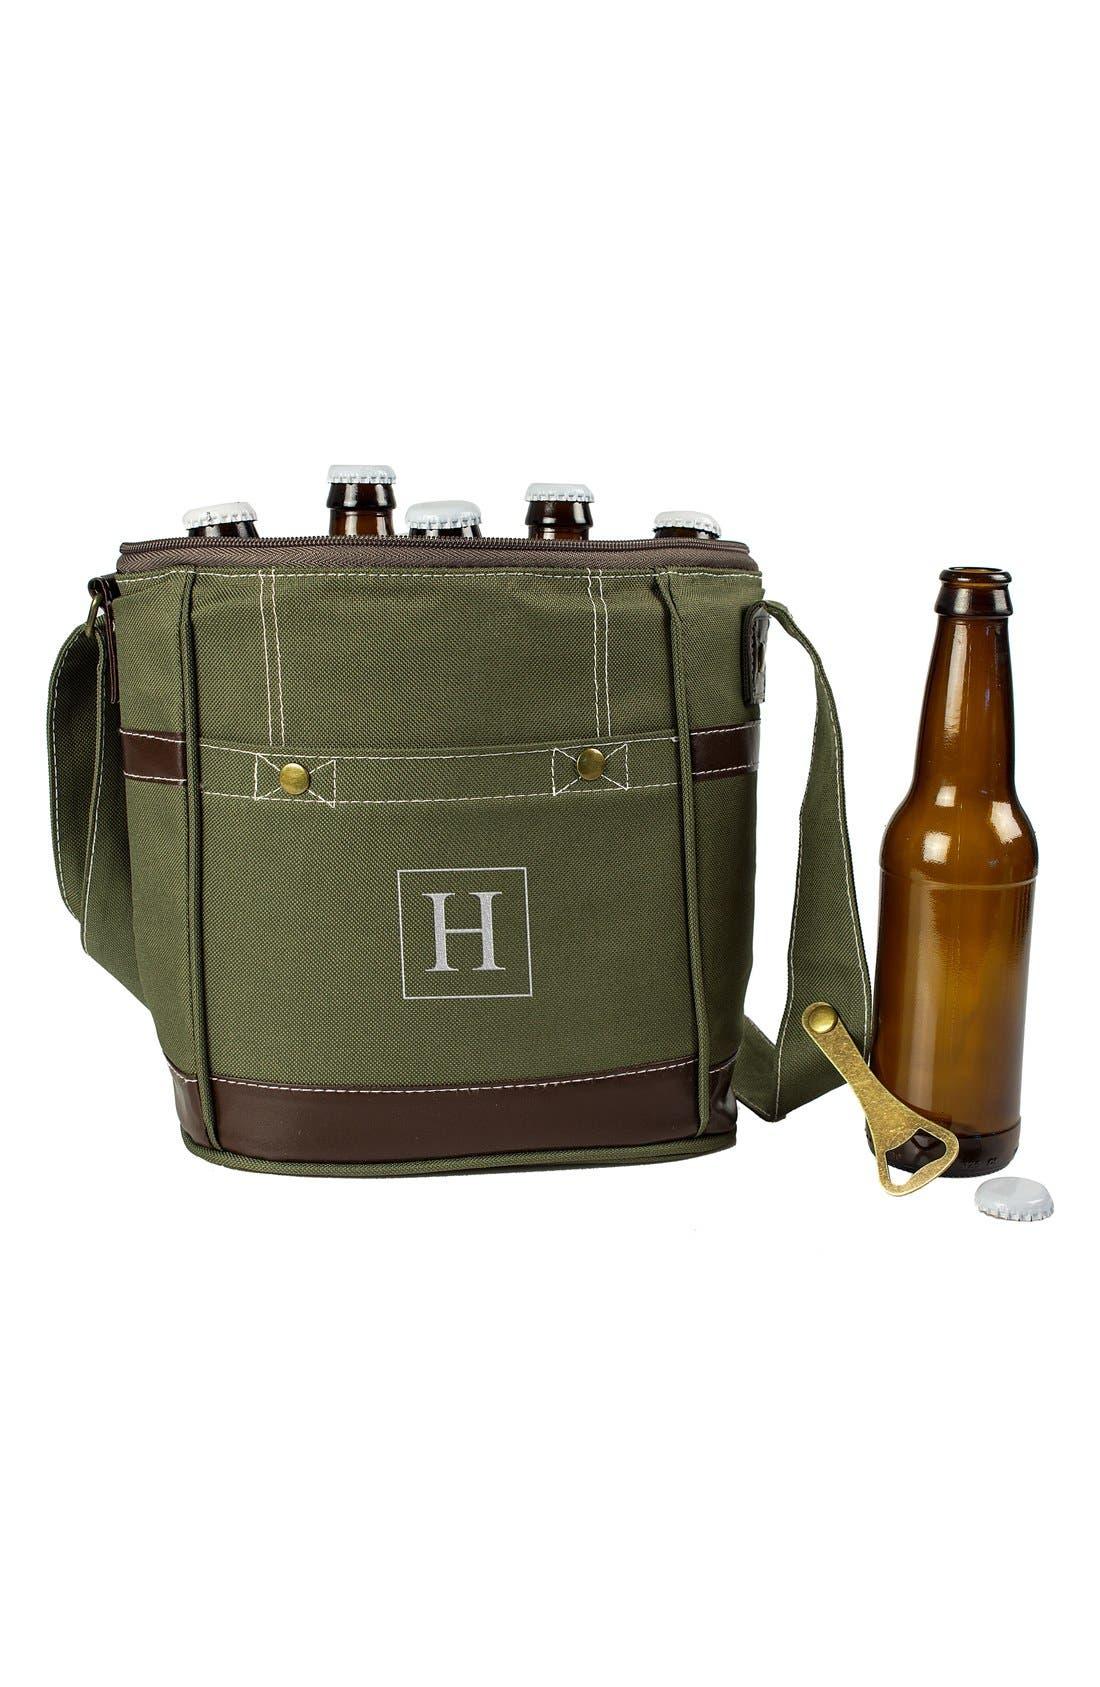 Monogram Six-Bottle Beer Cooler,                             Alternate thumbnail 2, color,